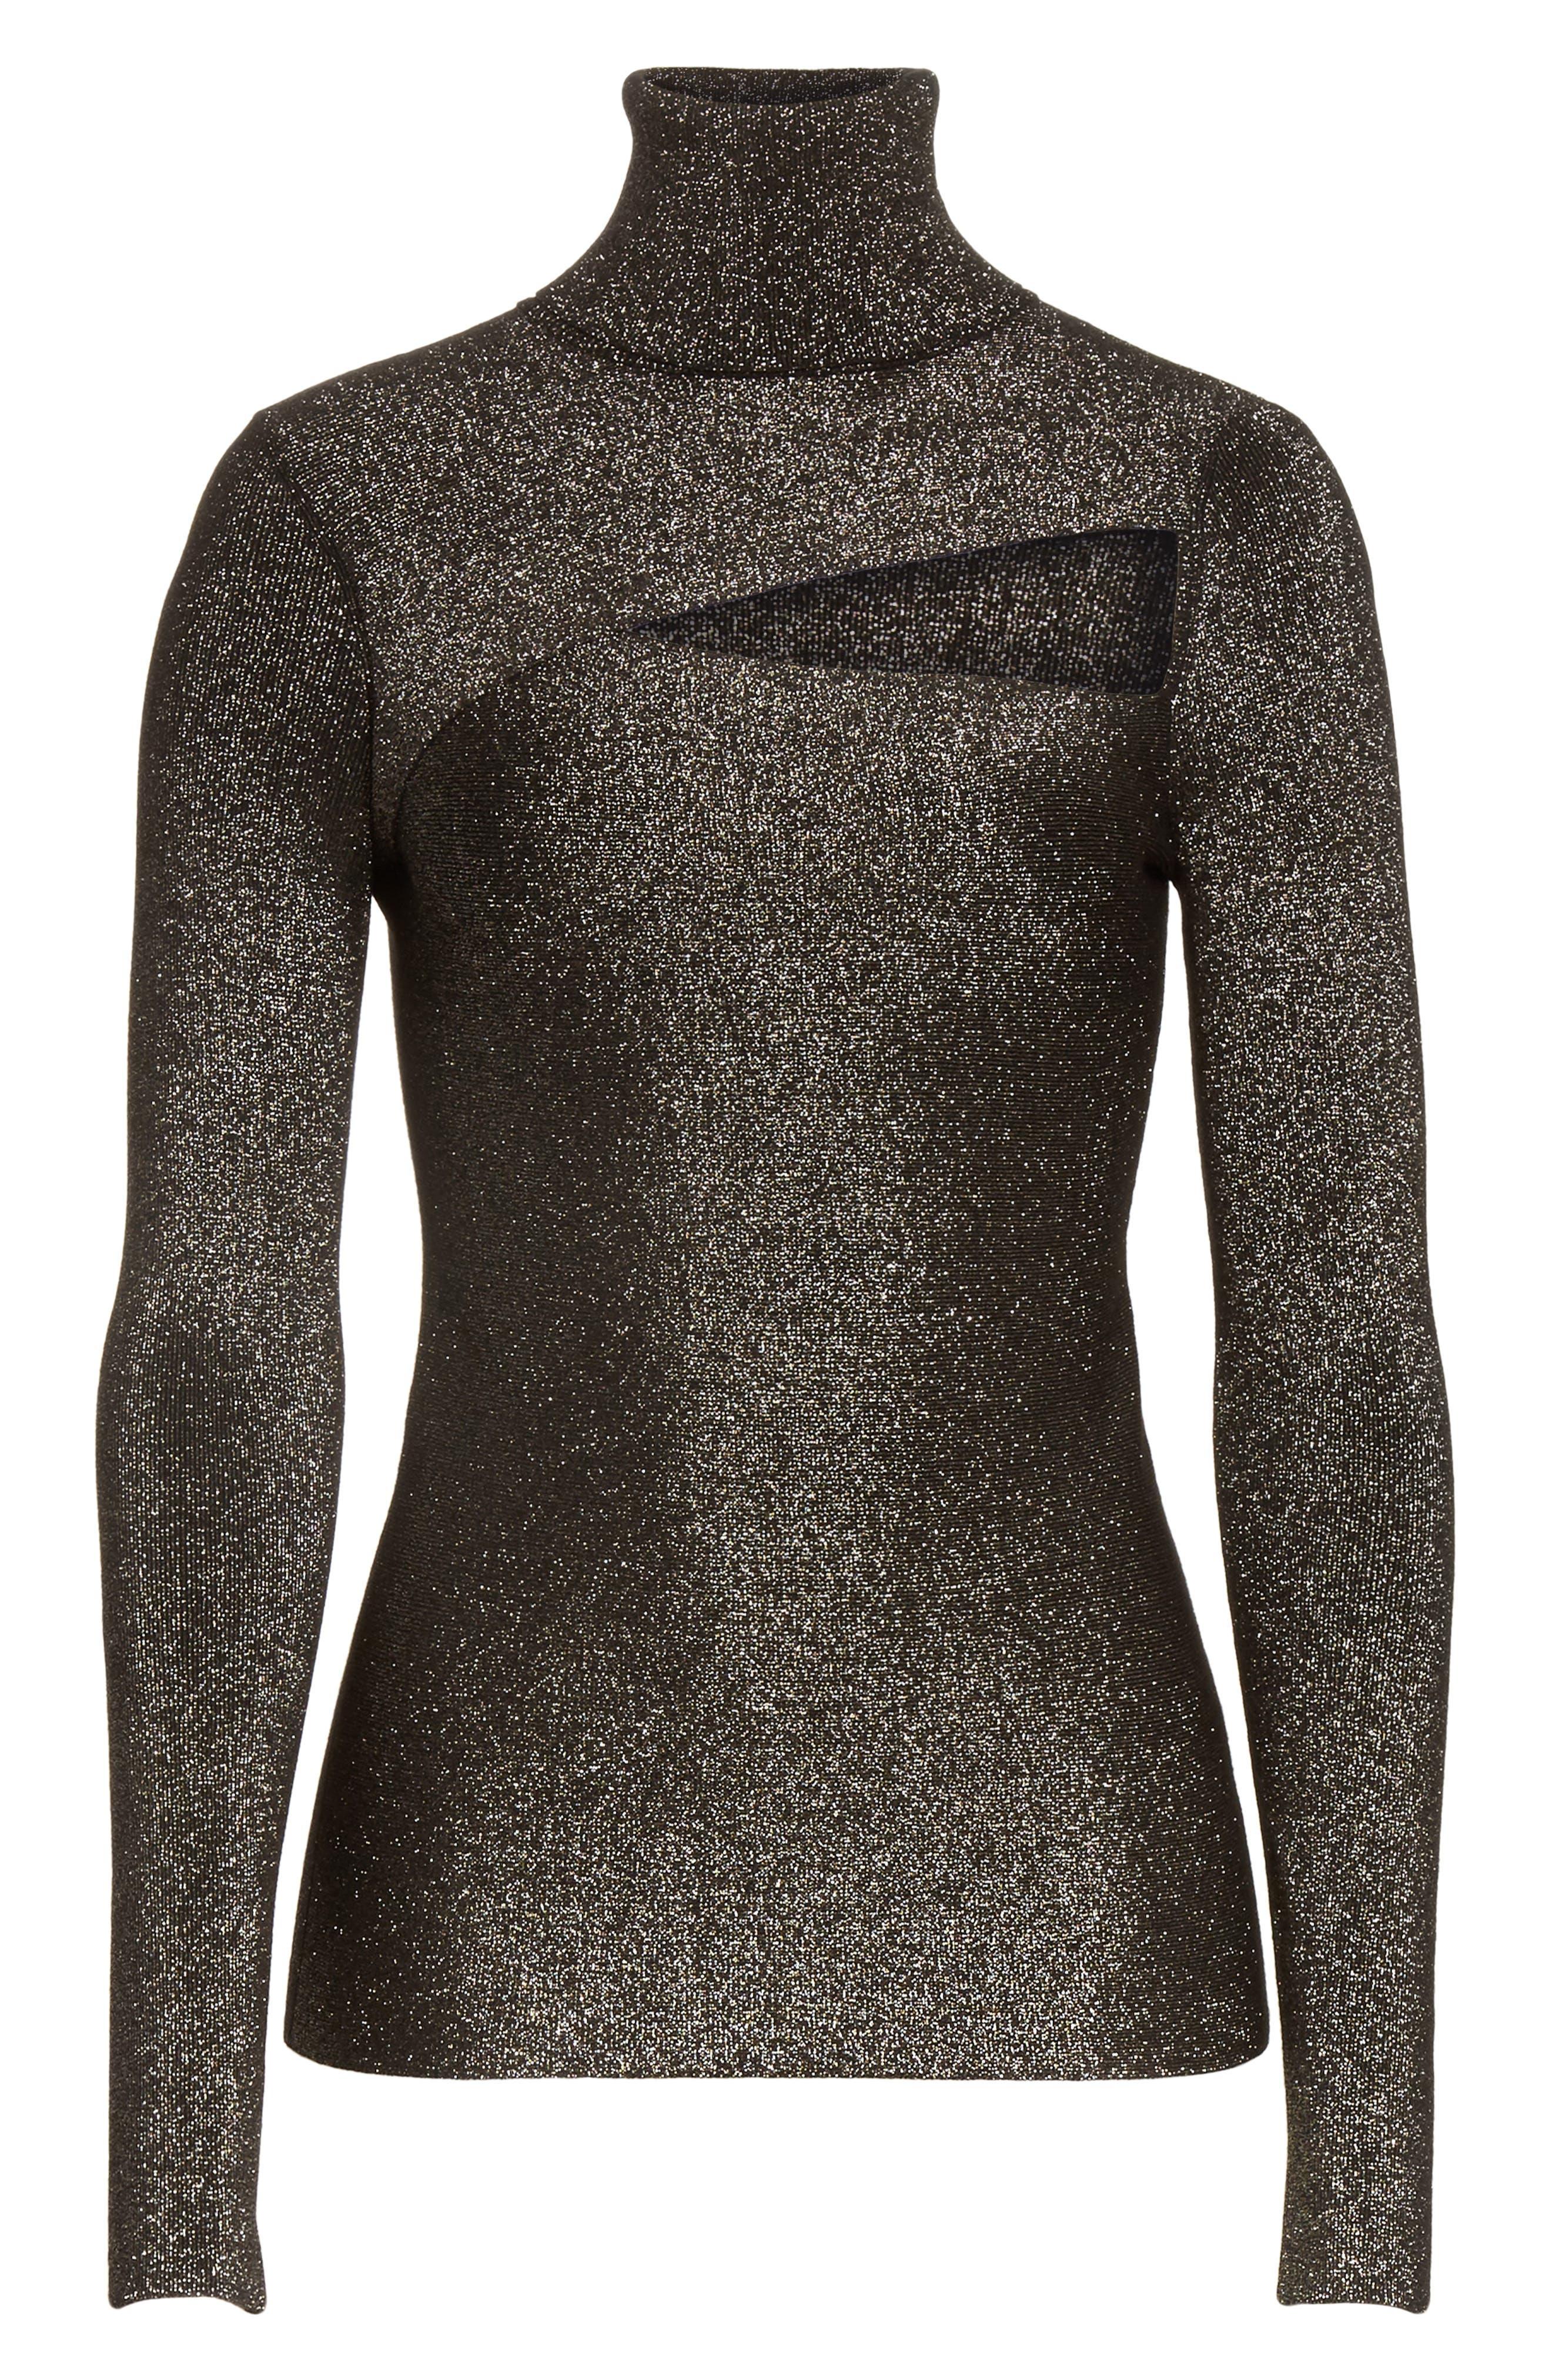 Camden Cutout Sweater,                             Alternate thumbnail 6, color,                             Black/ Gold